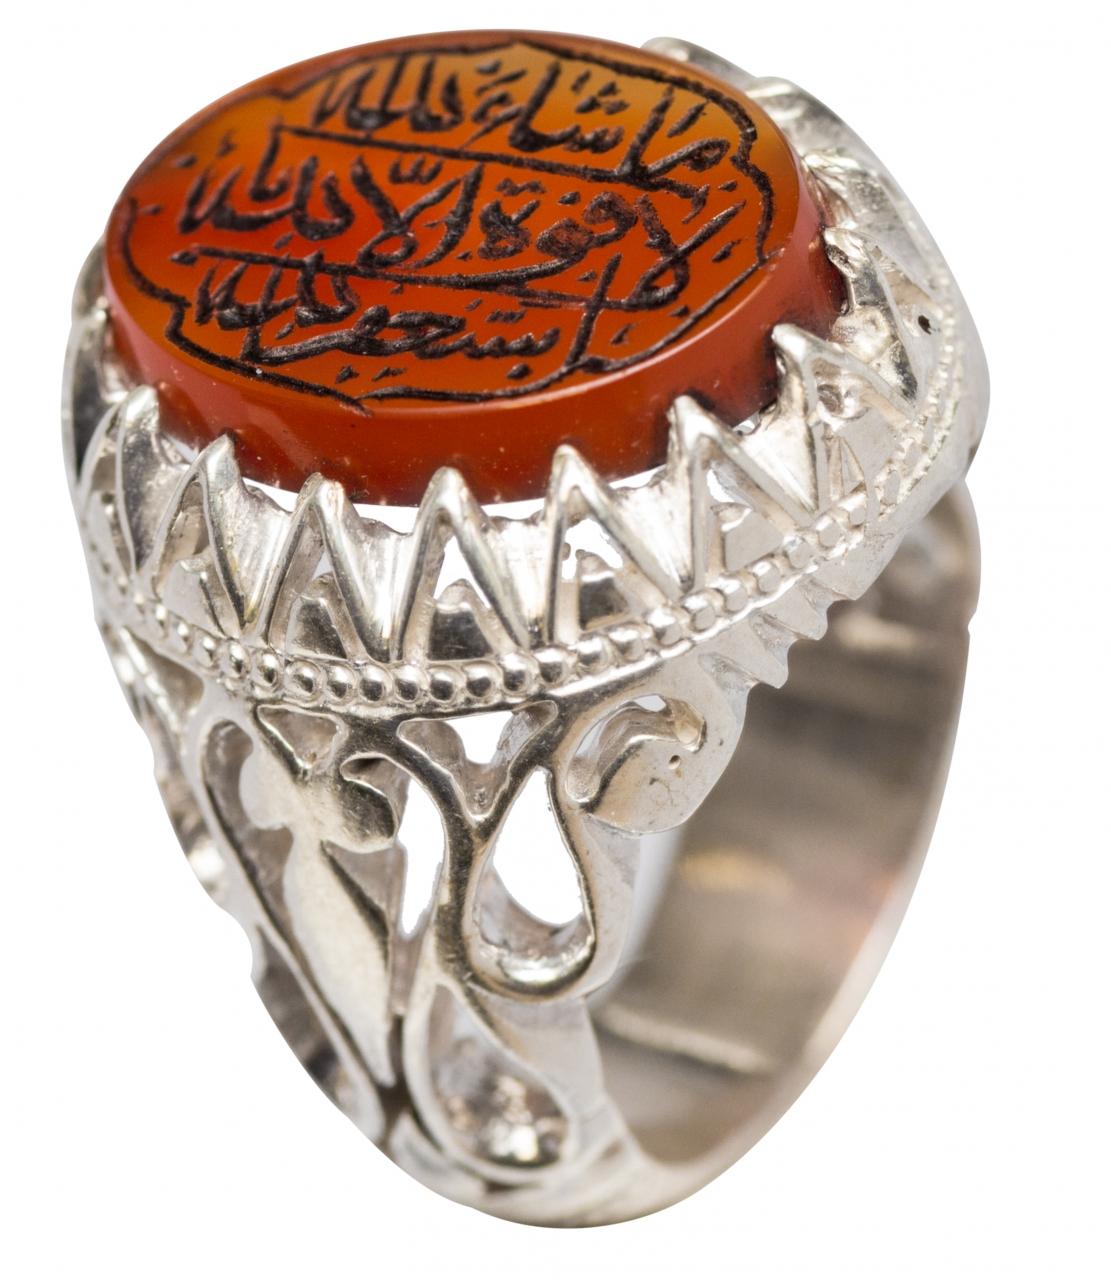 Massiver Aqiq Ring graviert mit Mashallah, Astaghforollah Größe 61